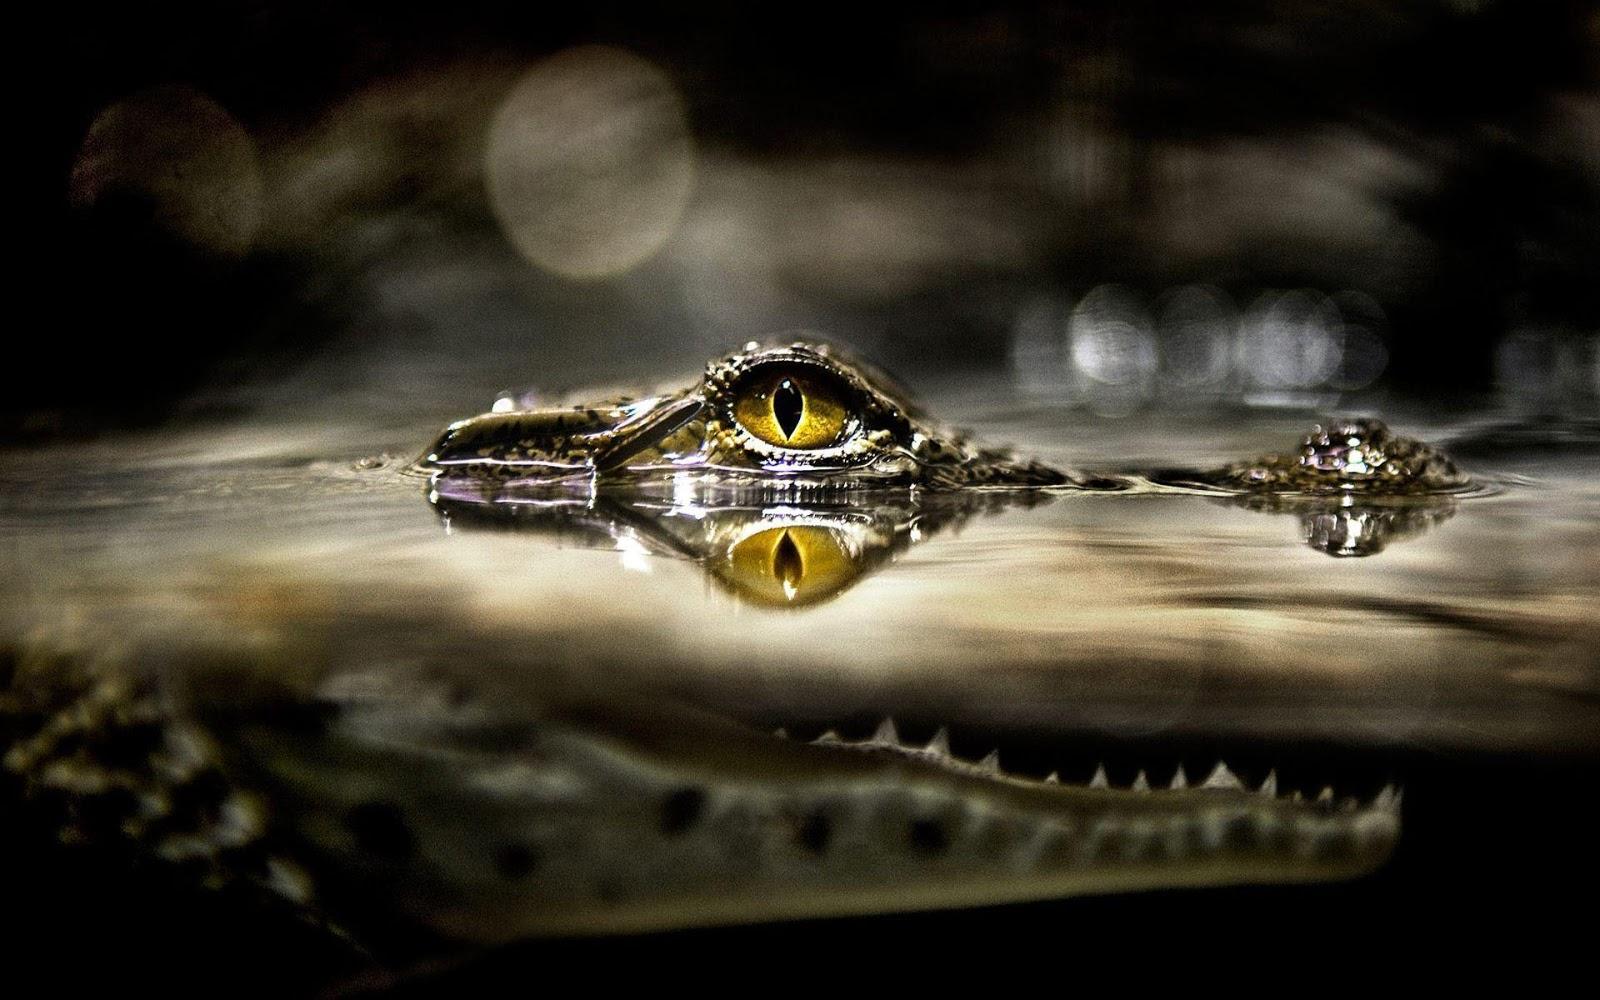 American Alligator Wallpapers